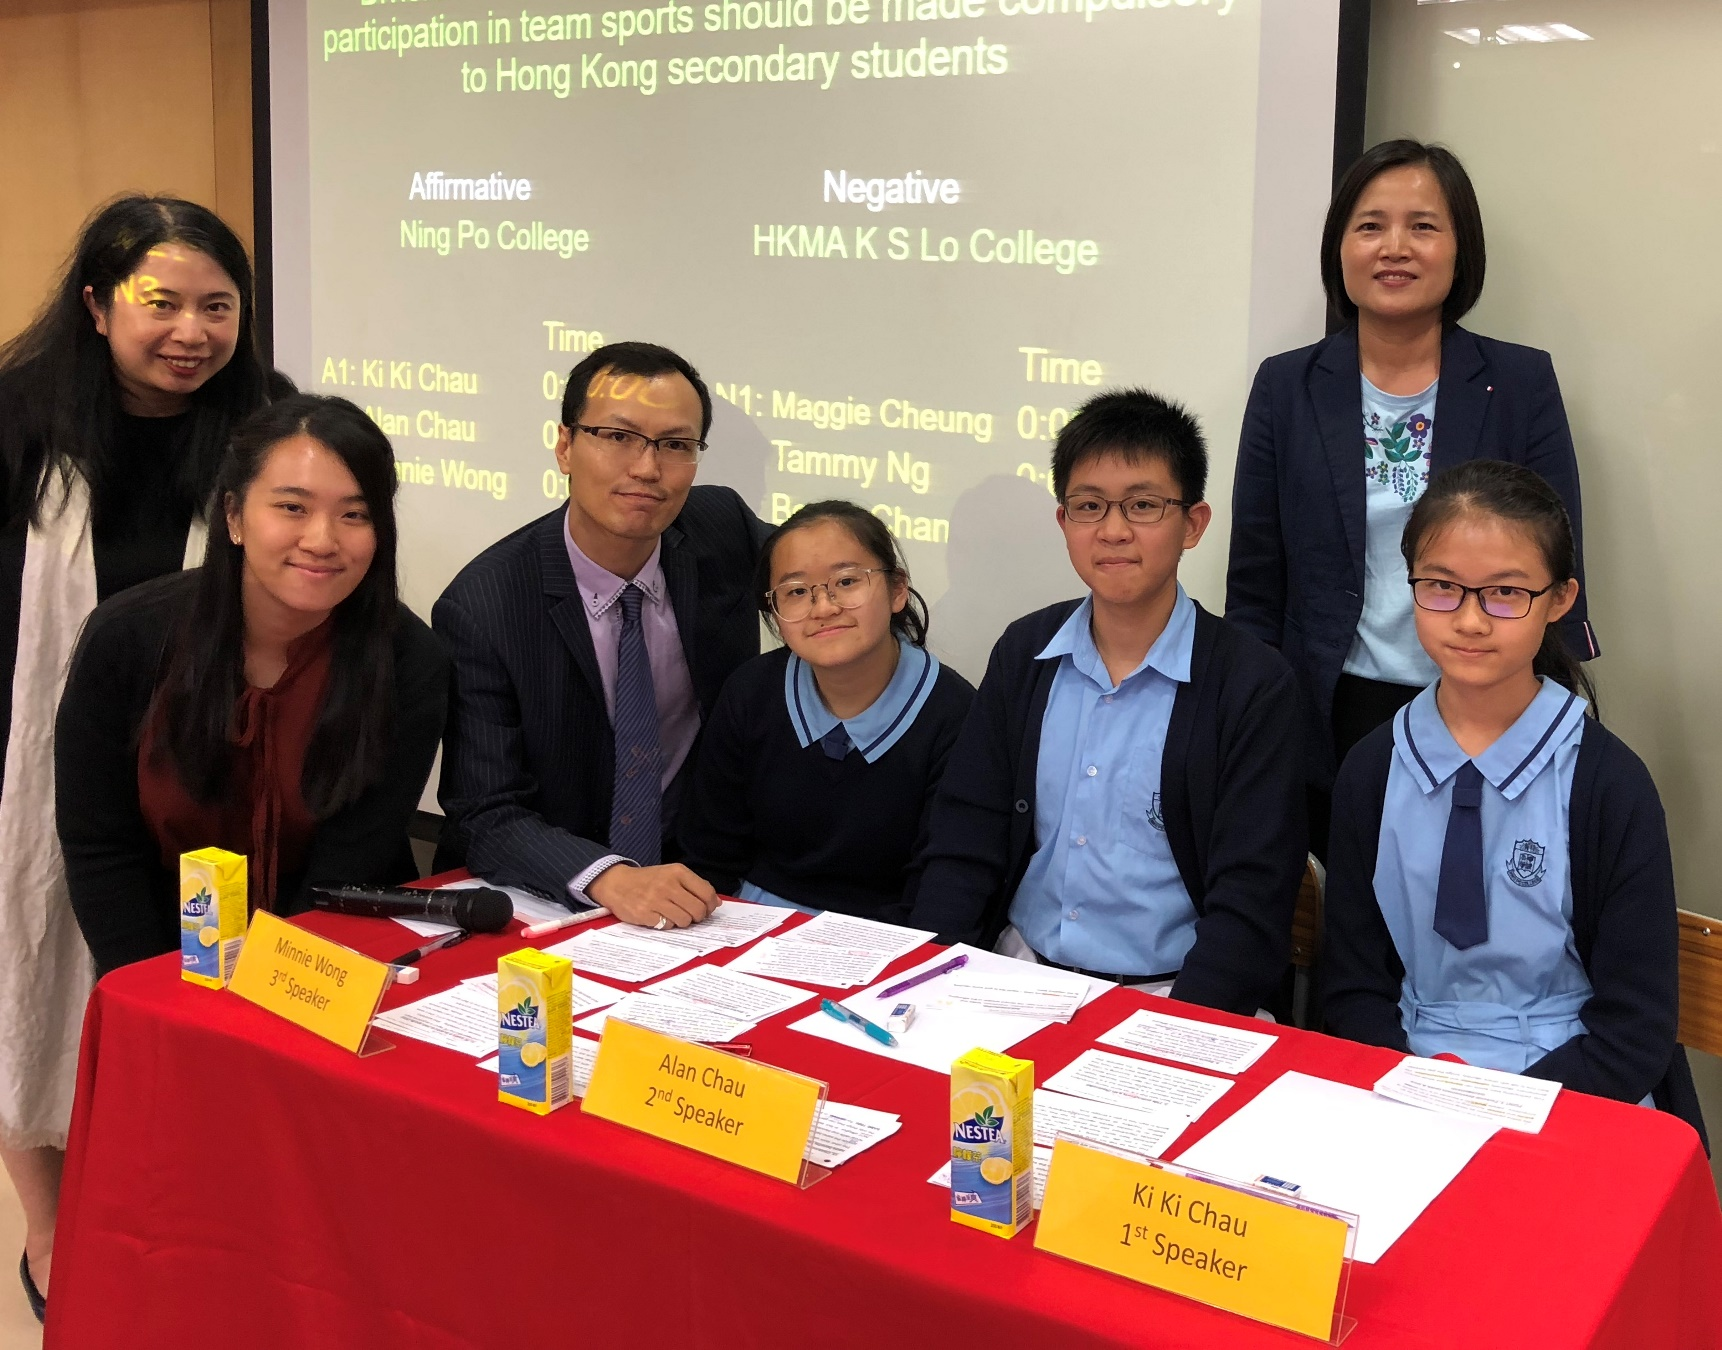 http://npc.edu.hk/sites/default/files/a_group_photo_w_p_and_ew.jpg